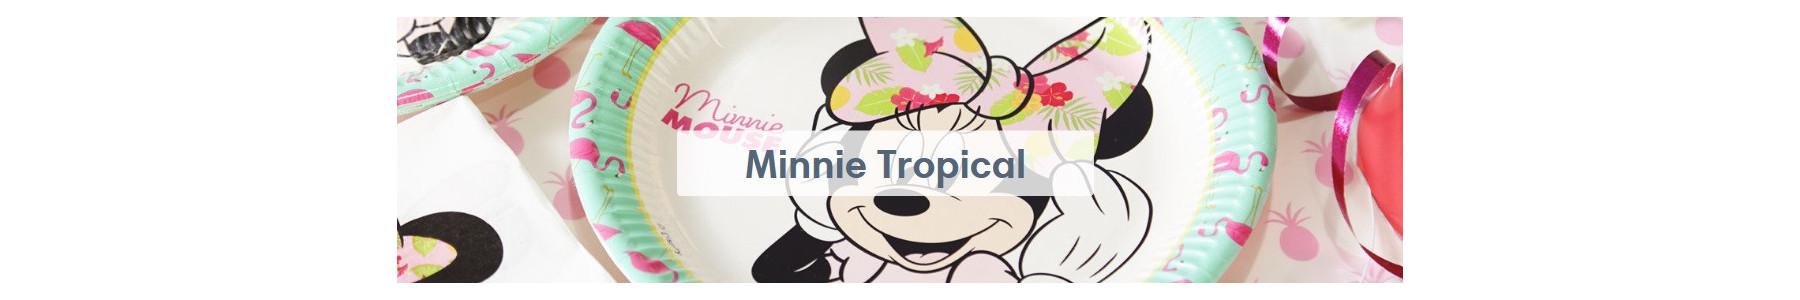 Articole party Minnie Tropical